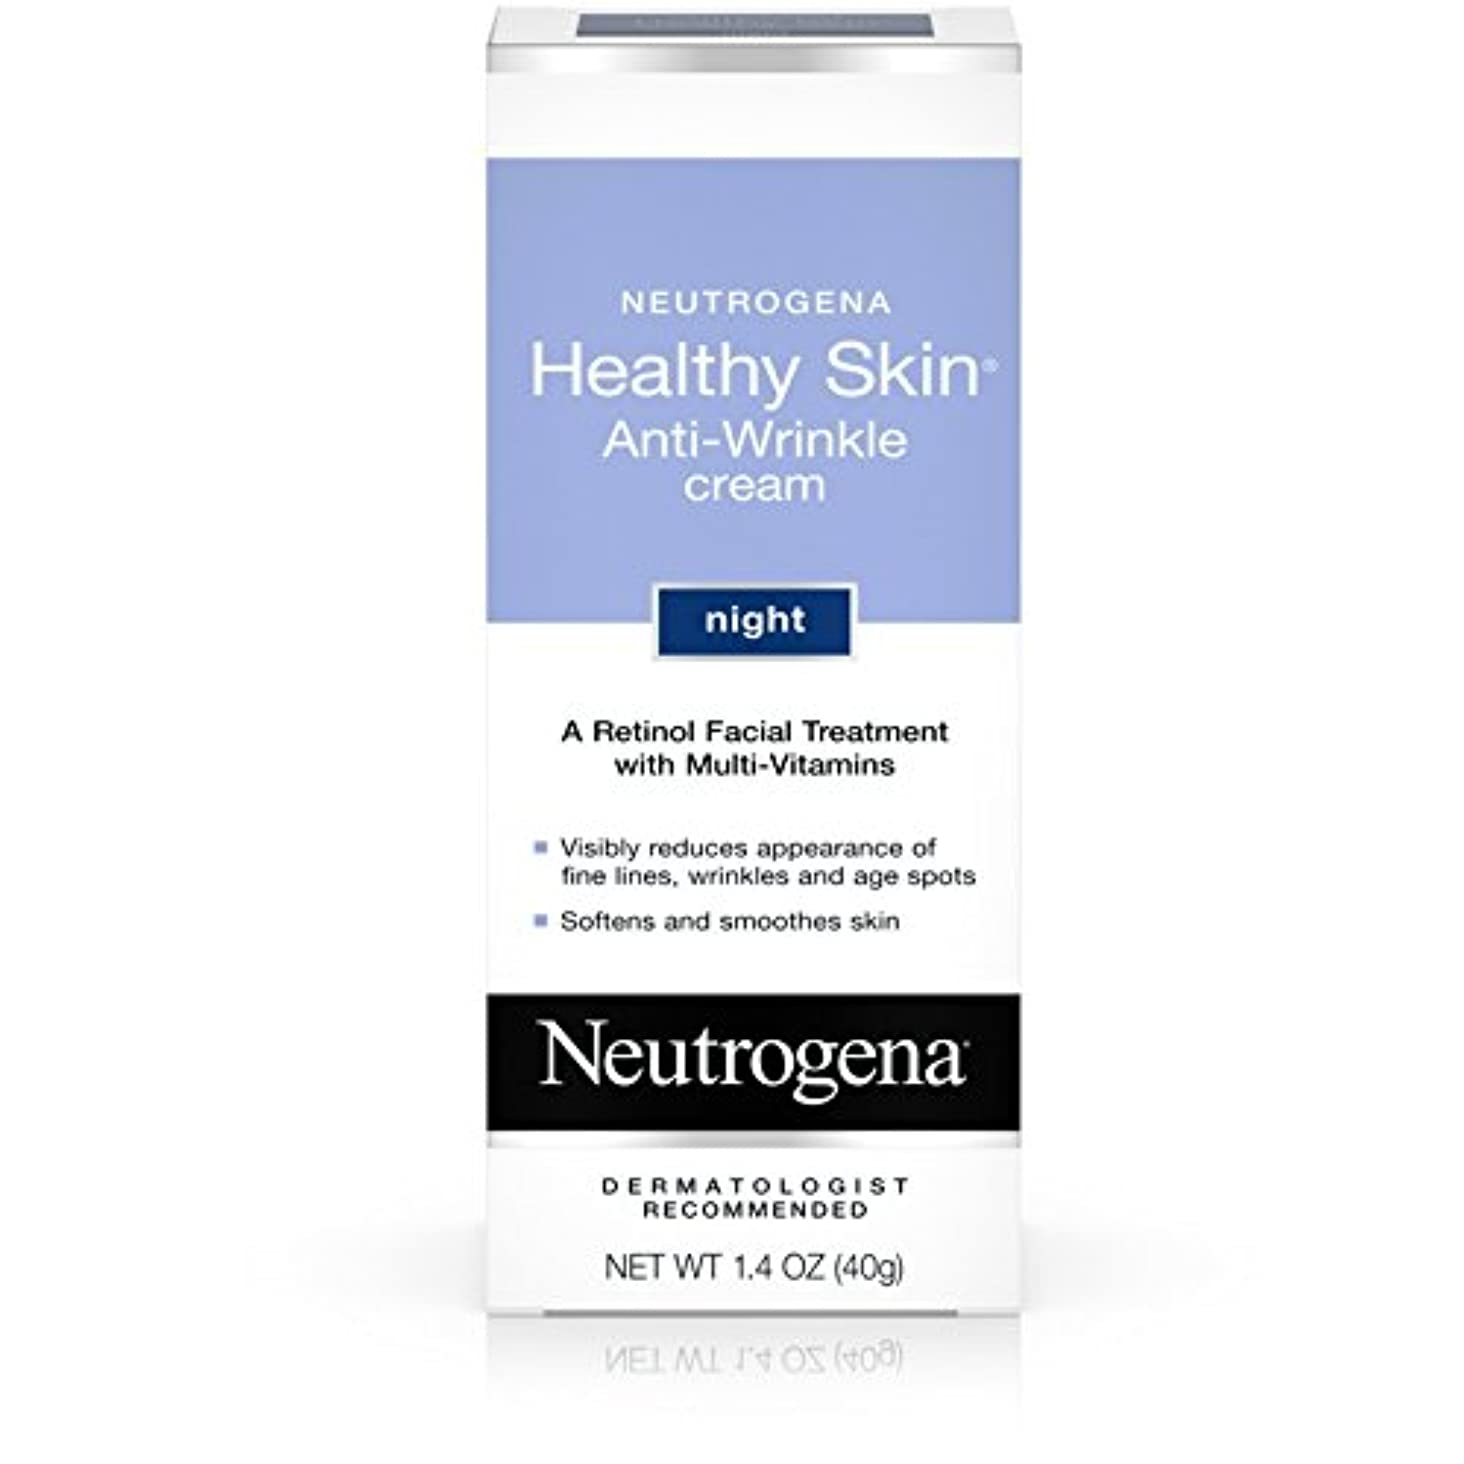 予約変な識別海外直送肘 Neutrogena Healthy Skin Anti-Wrinkle Night Cream, 1.4 oz